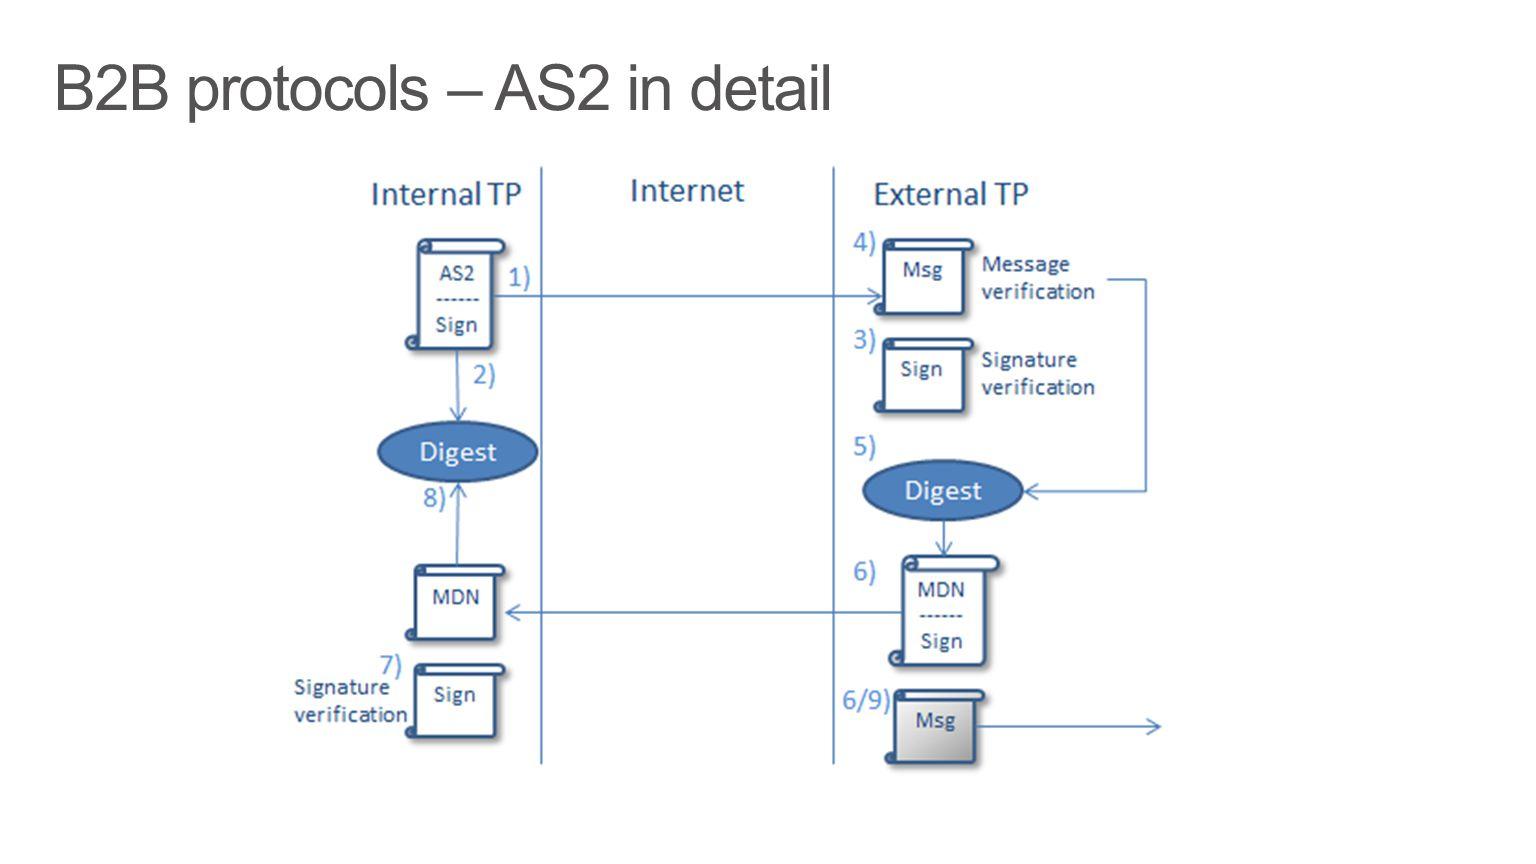 B2B protocols – AS2 in detail